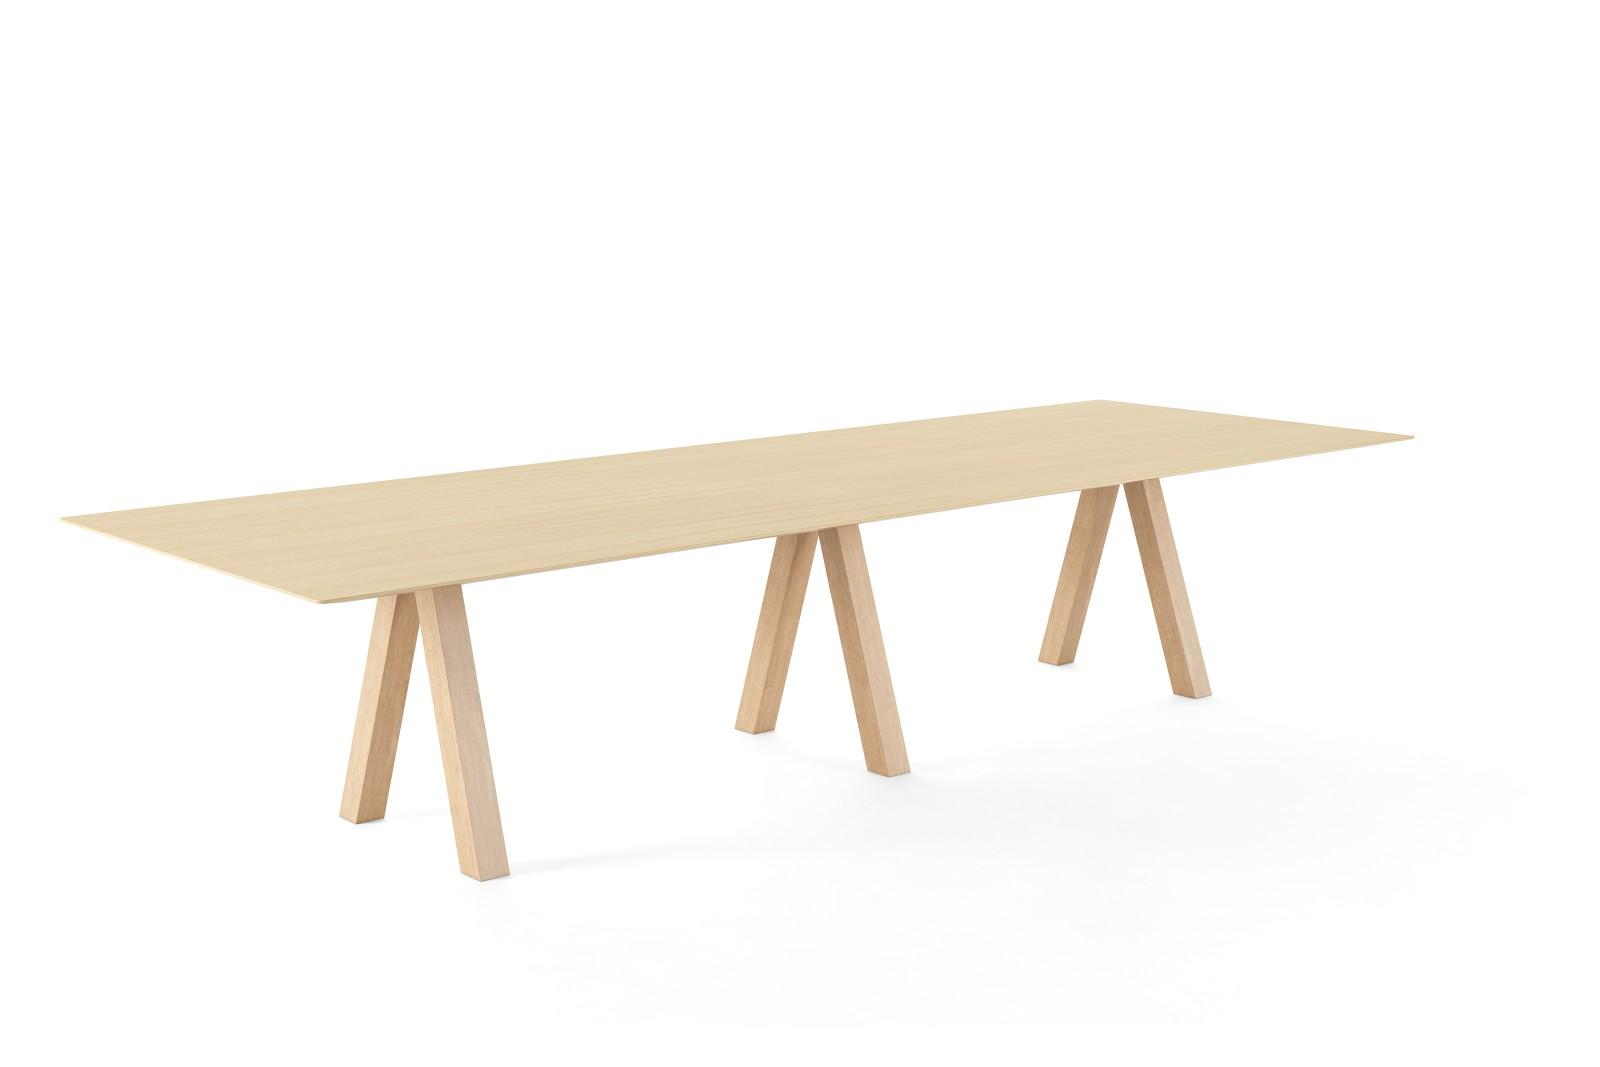 Trestle Double Table Matt Oak, Matt Oak, 360w x 90d x 74h cm